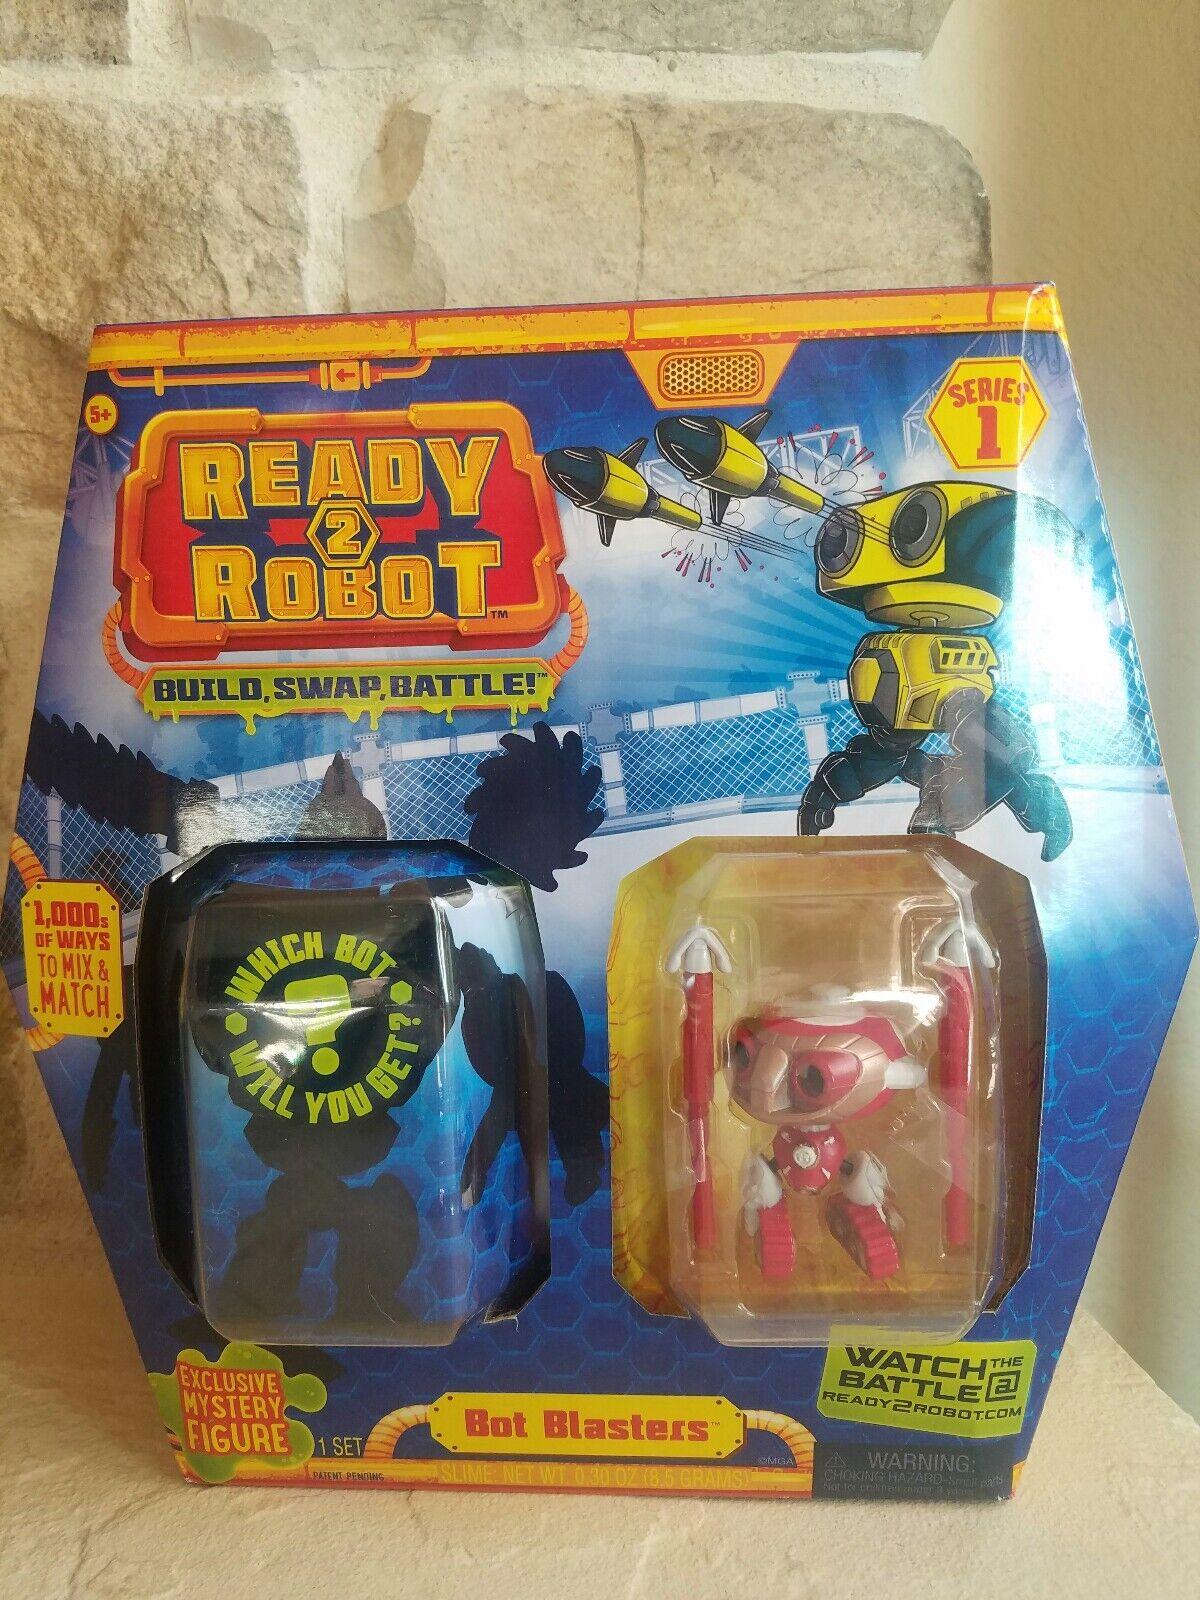 Ready 2 Robot Robot Robot Bot Blasters ba3fc8